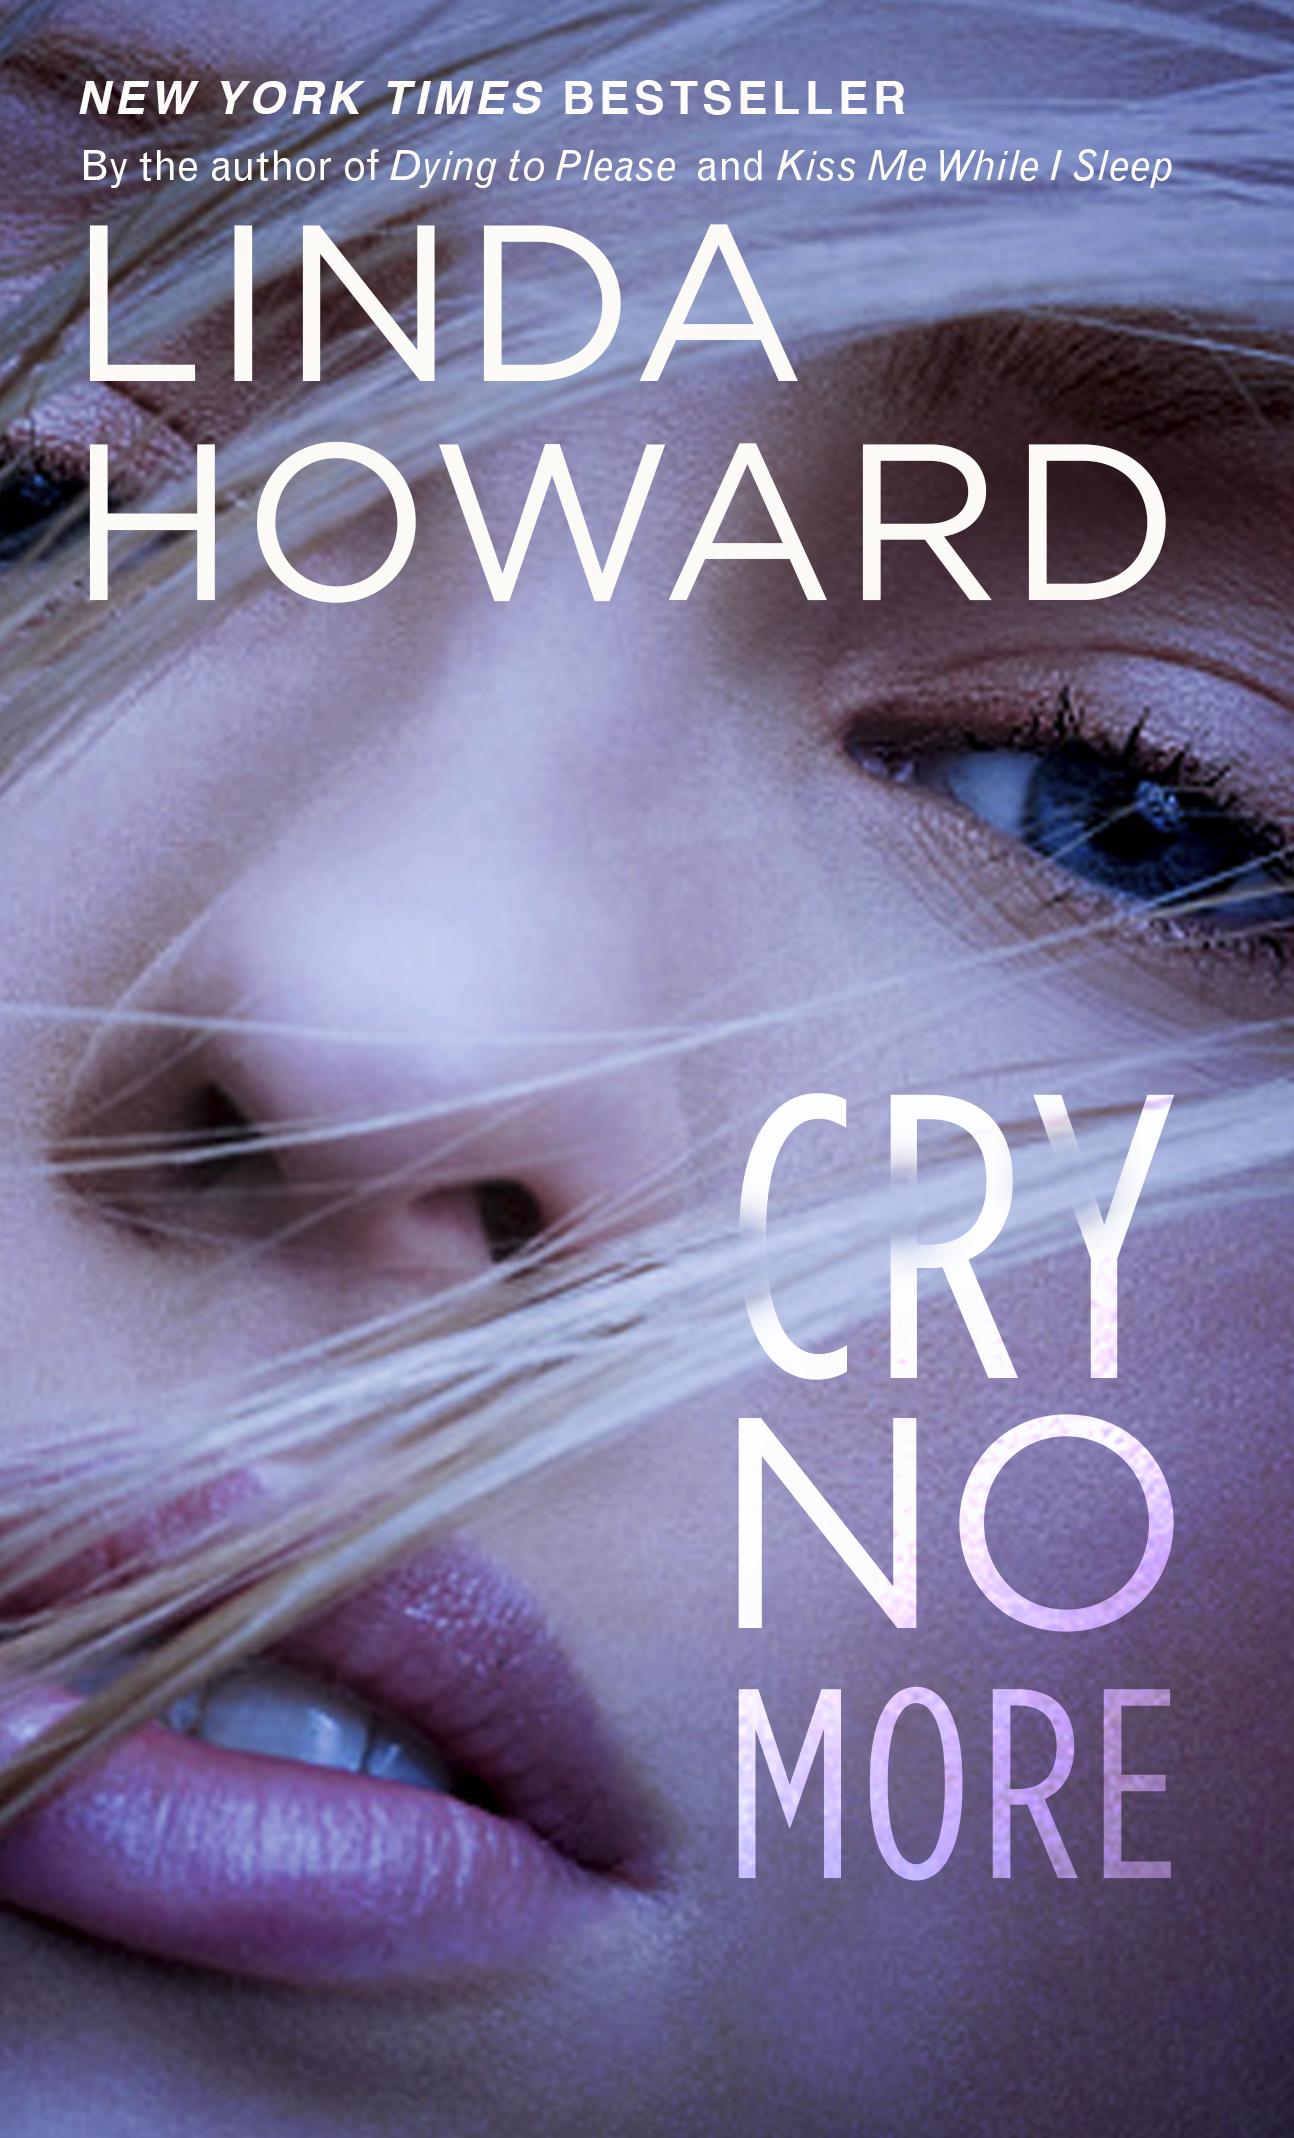 10-22_B_Cry no More woman hair blowing2.jpg